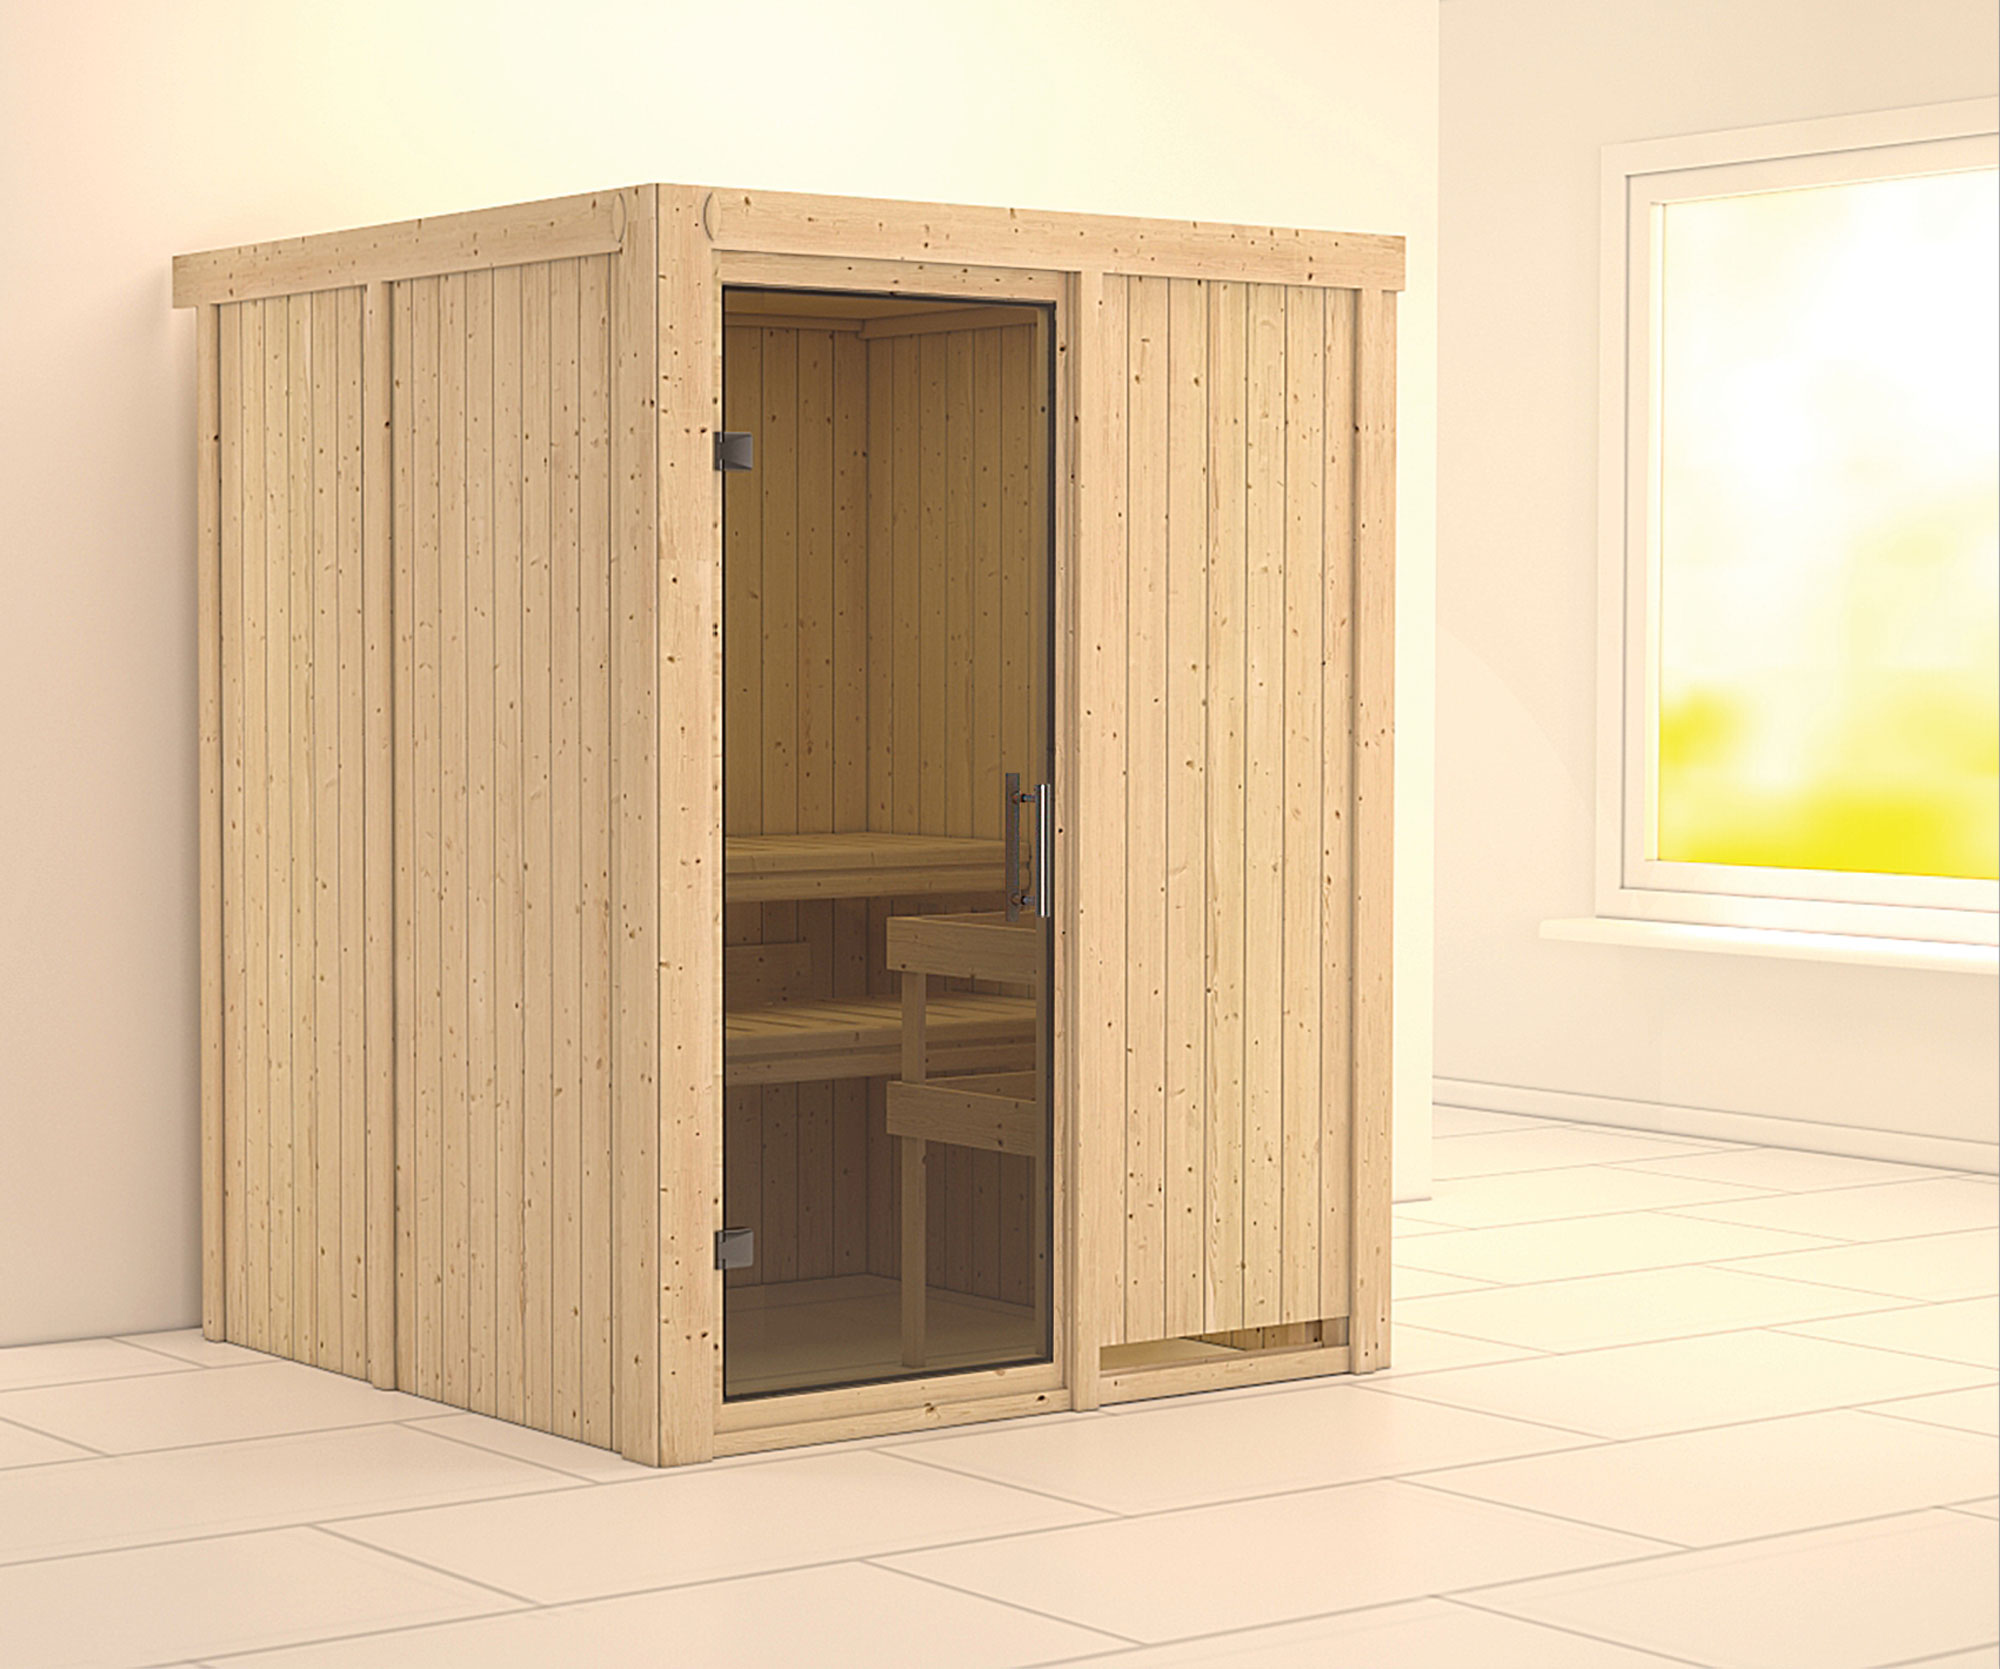 Karibu Sauna Norin 68mm ohne Saunaofen moderne Tür Bild 1